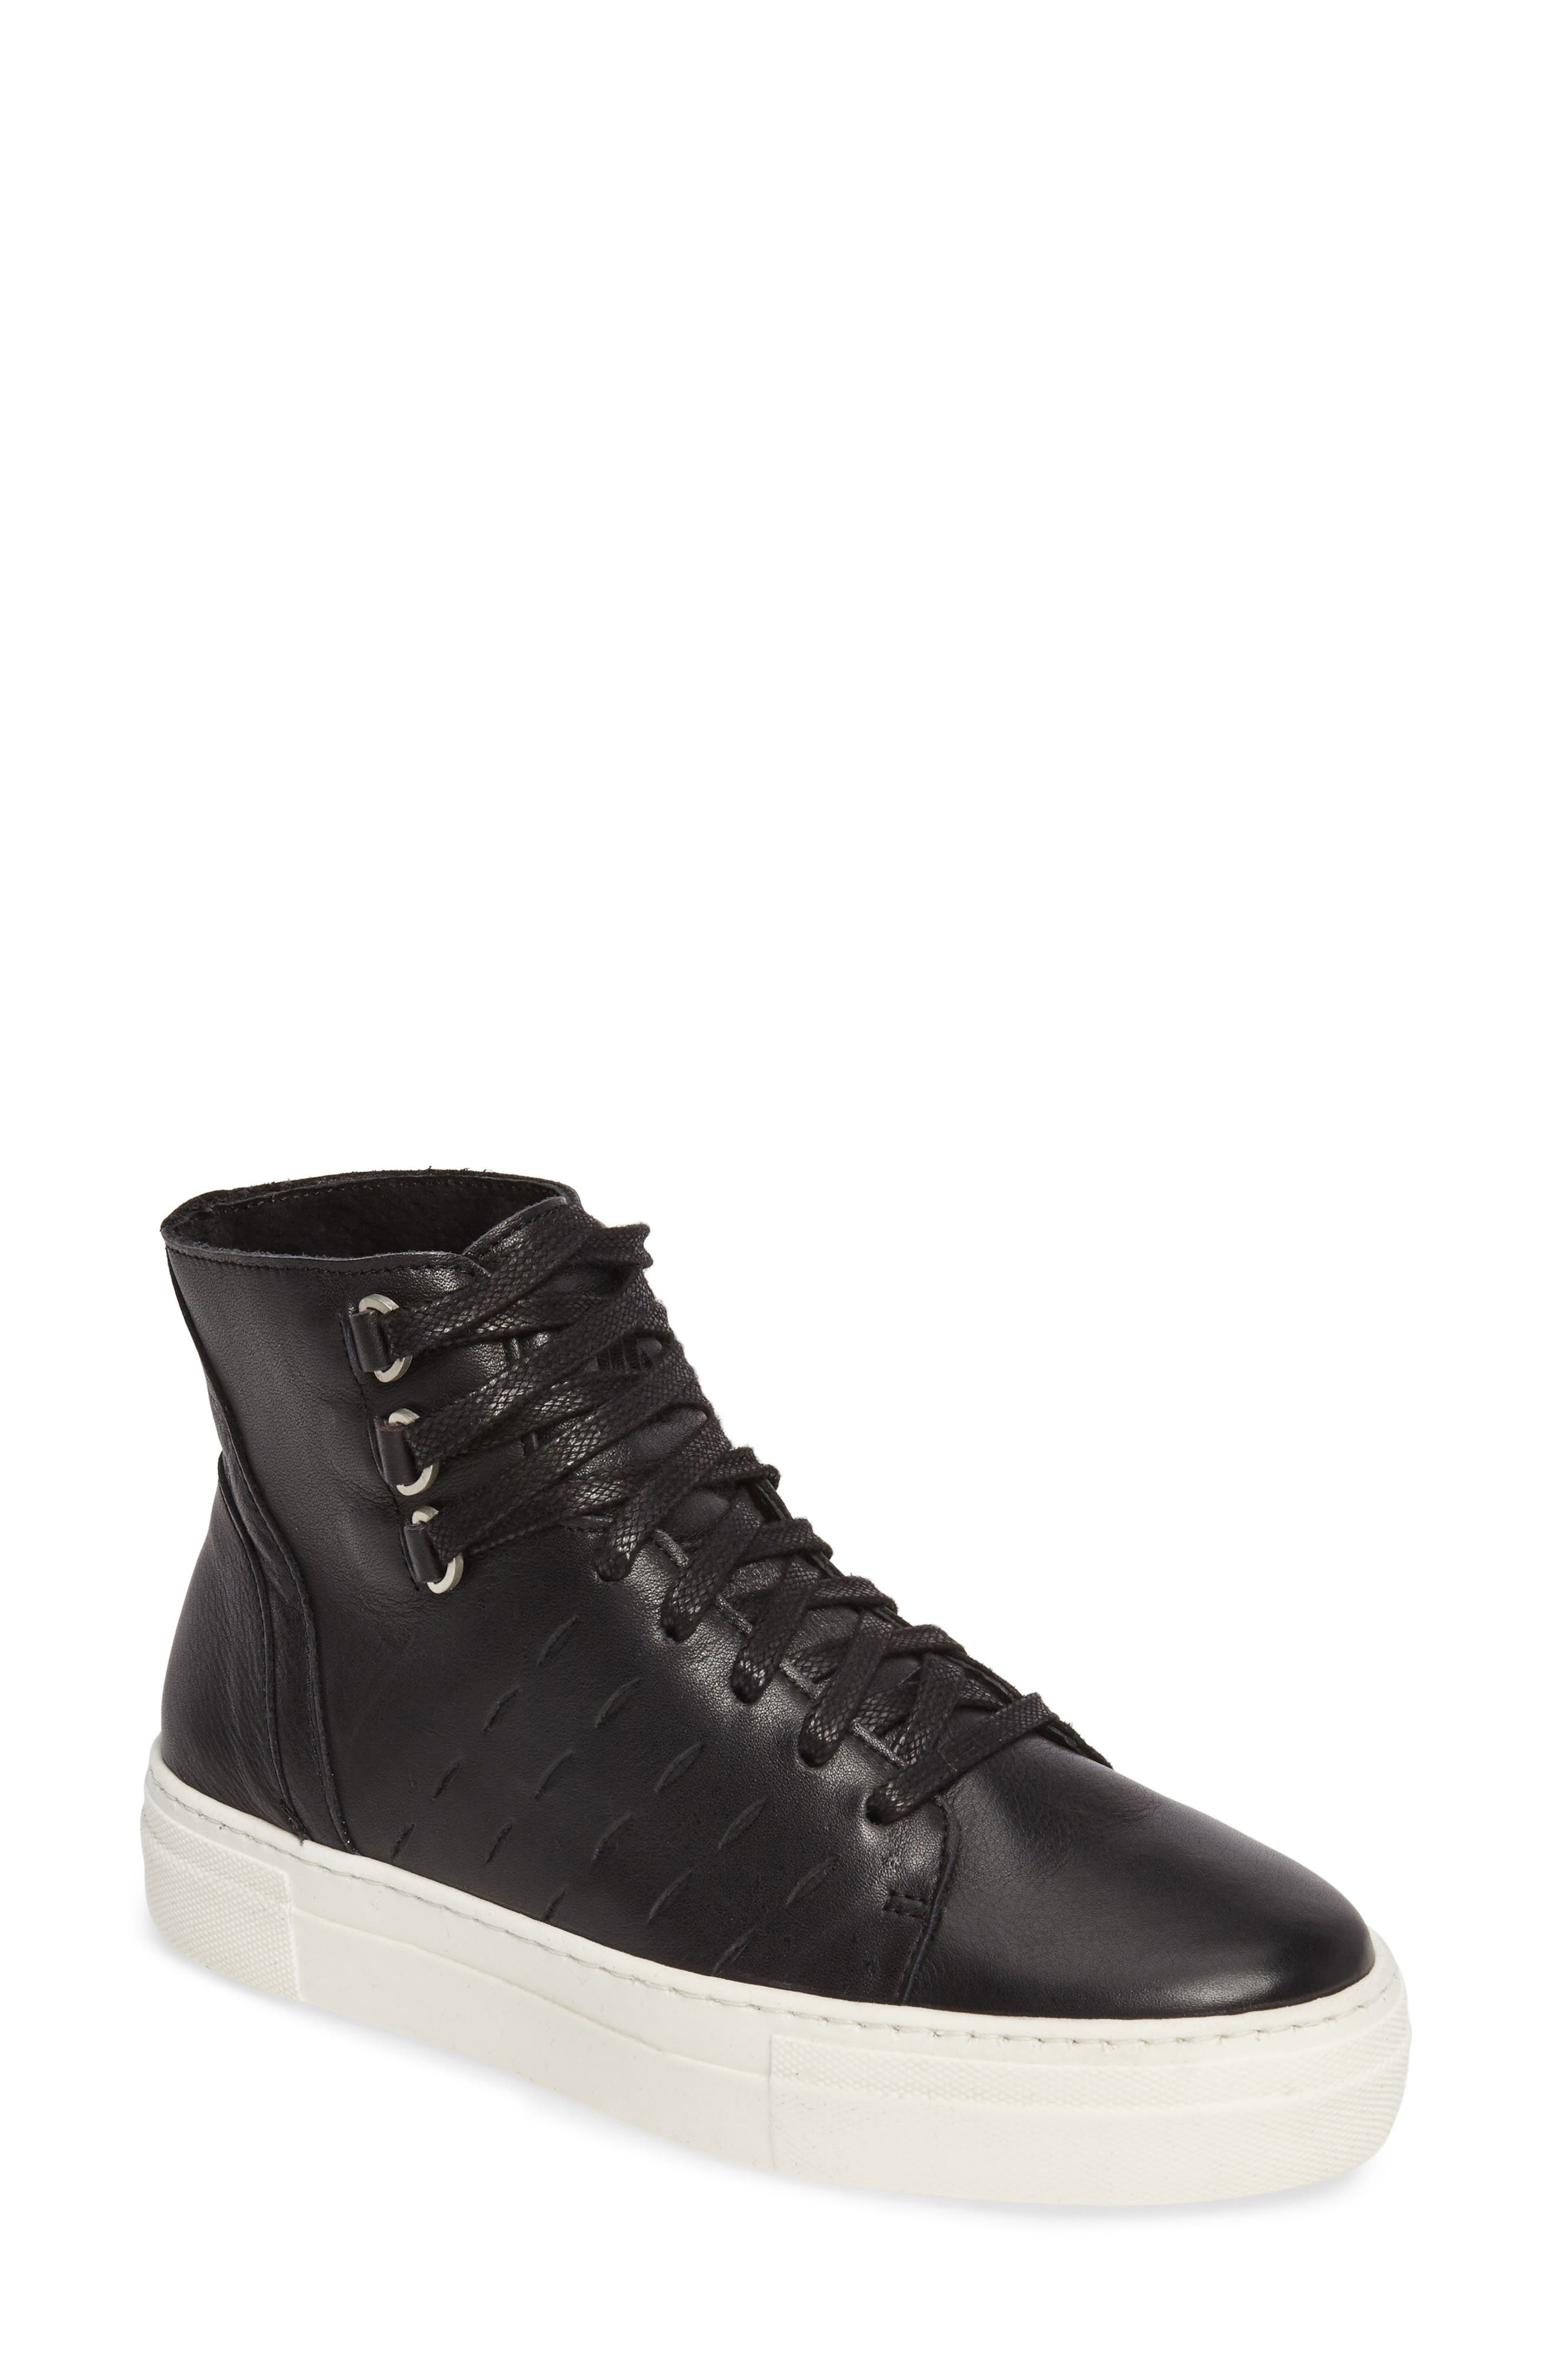 Modern High Top Sneaker,                         Main,                         color, BLACK/ OFF WHITE